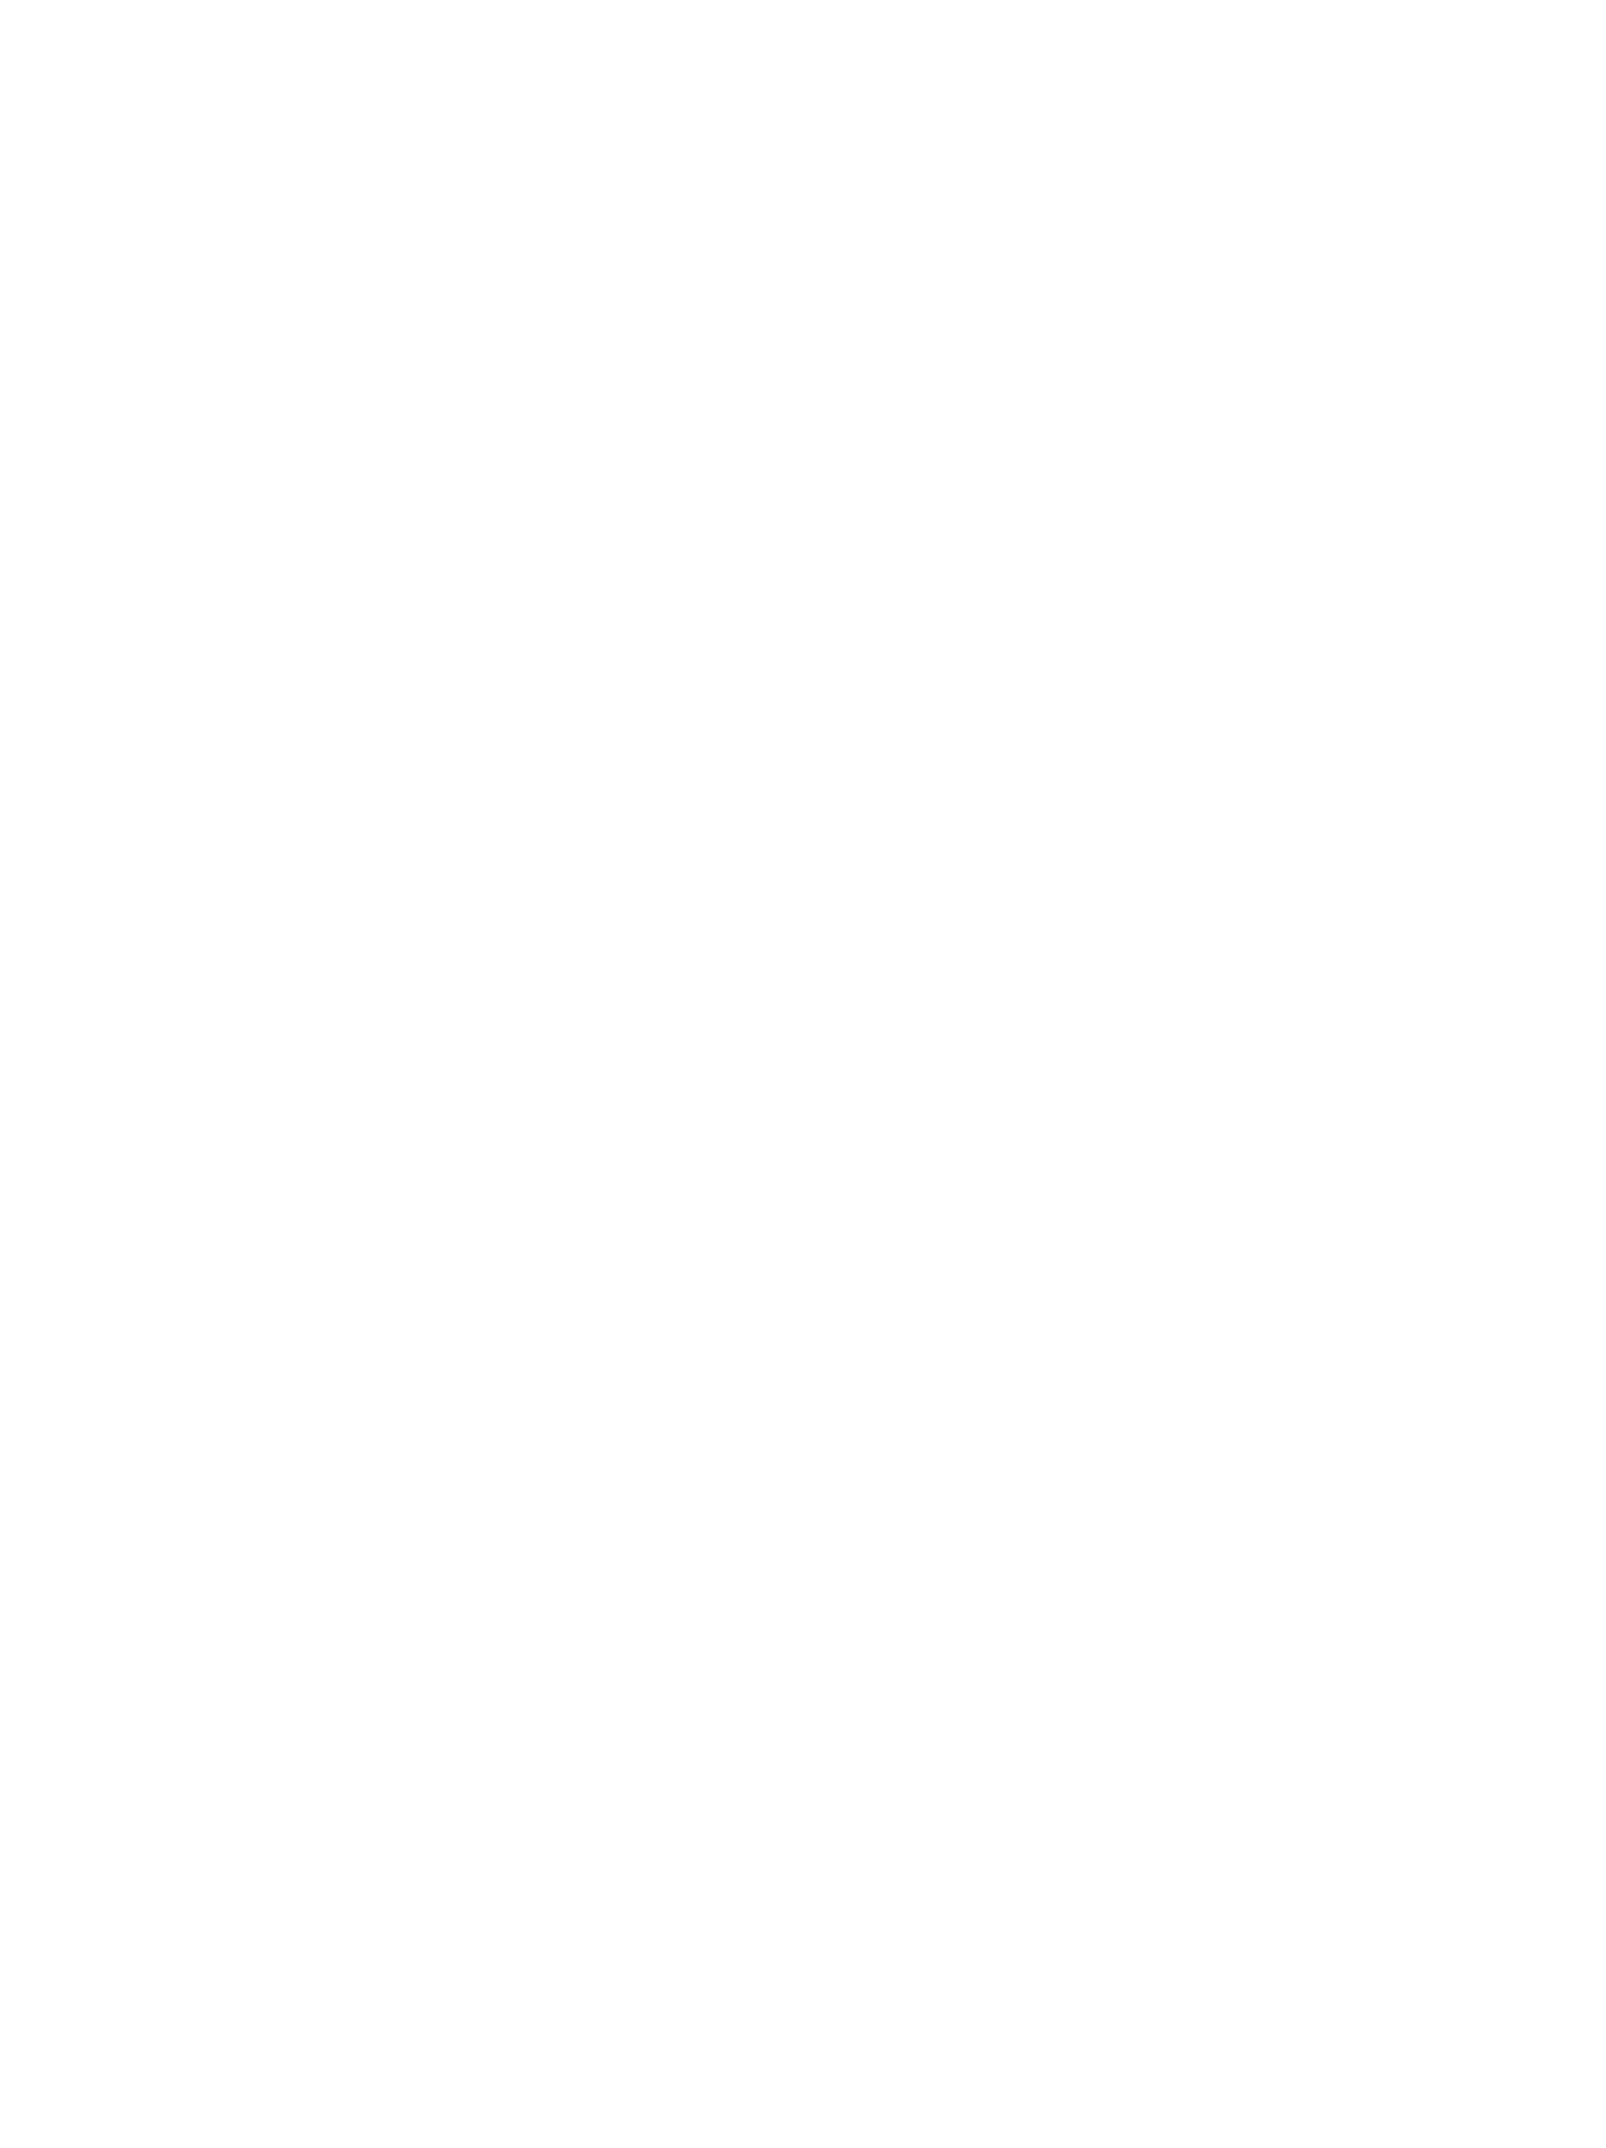 Turngemeinde Wolfenbüttel e.V.